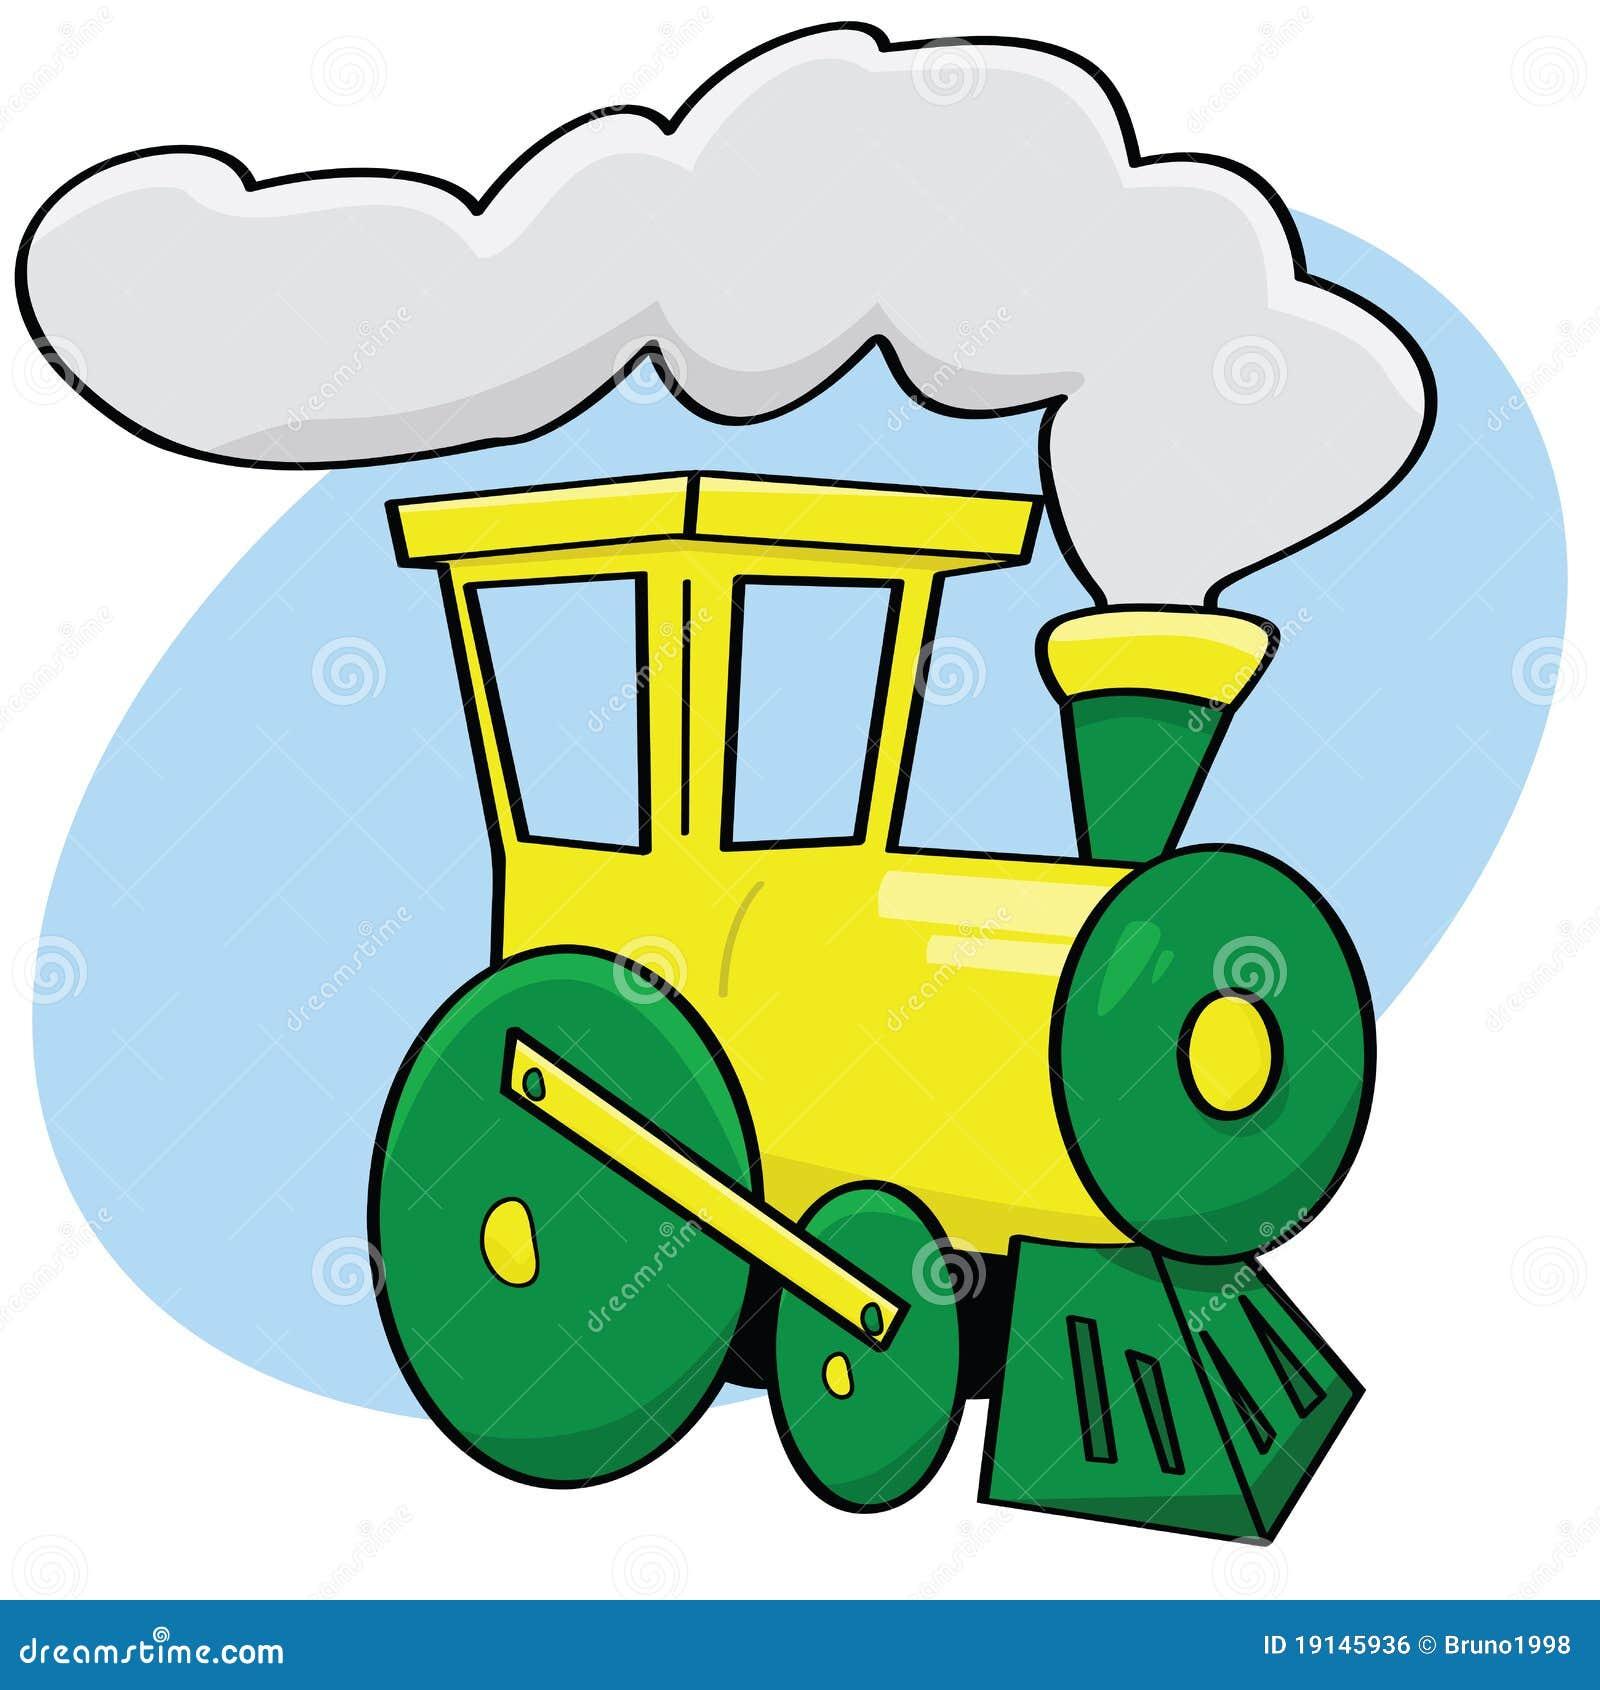 Cartoon Train Stock Illustrations – 9,493 Cartoon Train Stock ...